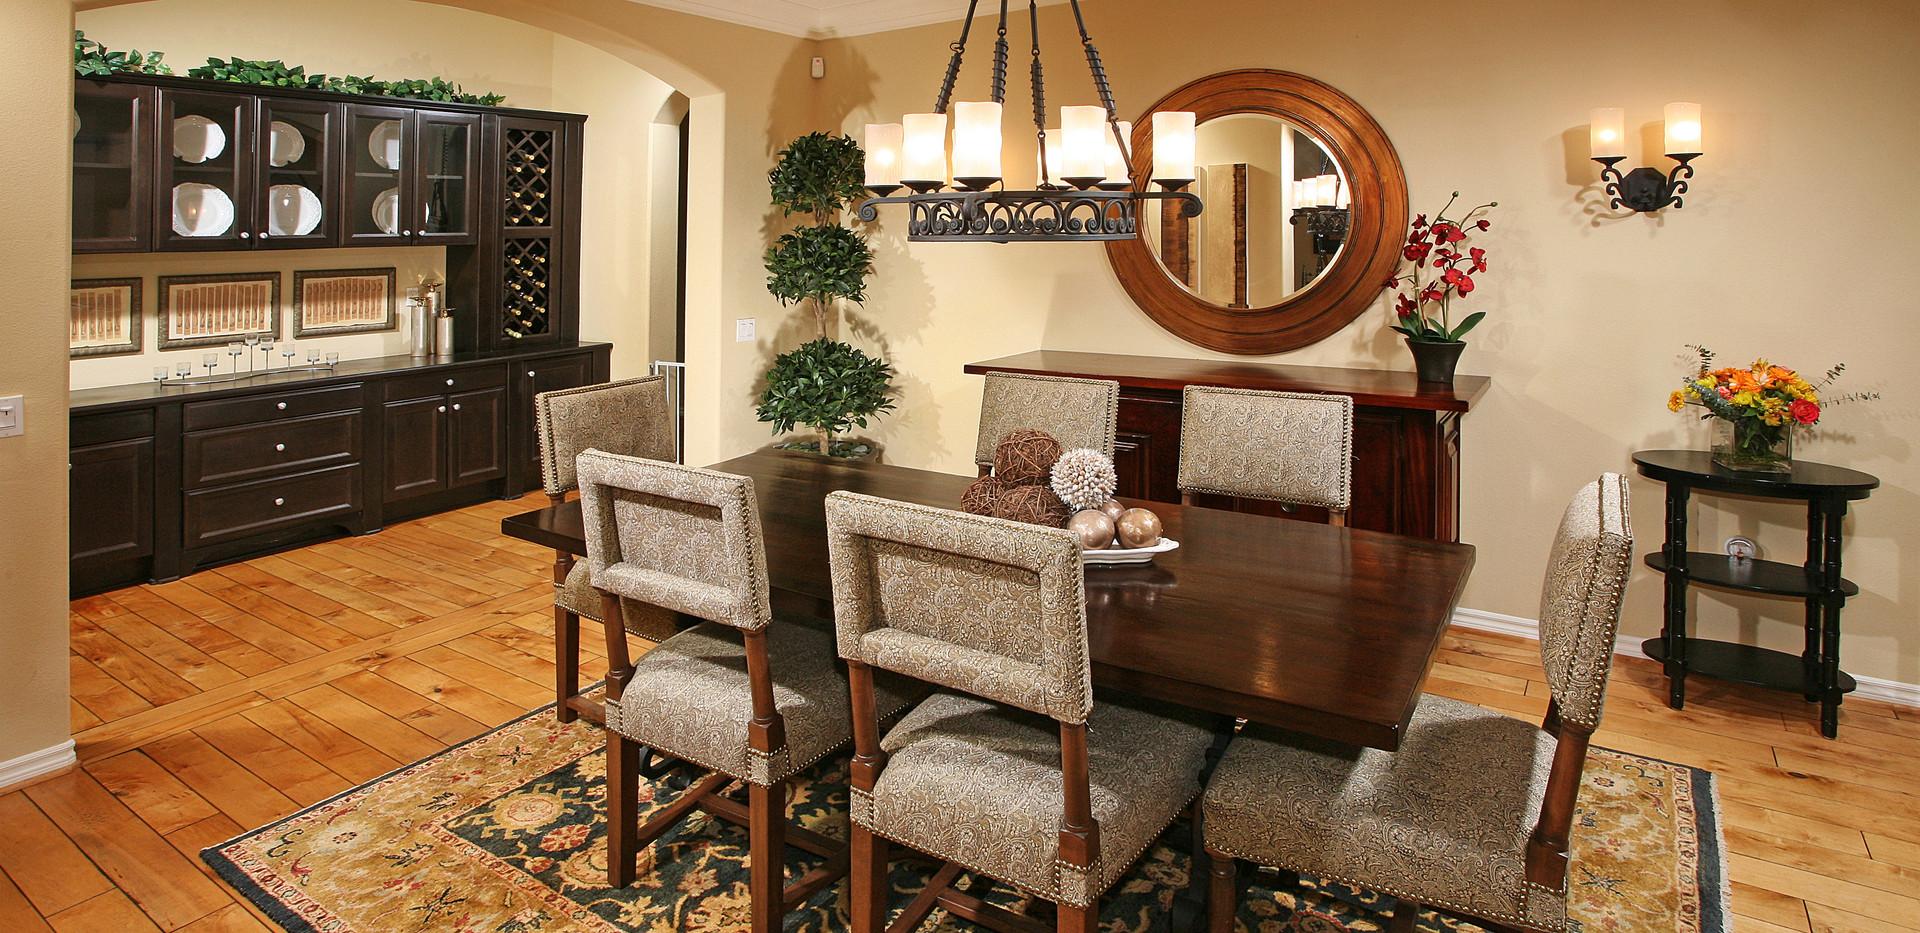 Turnstone Dining Room.jpg